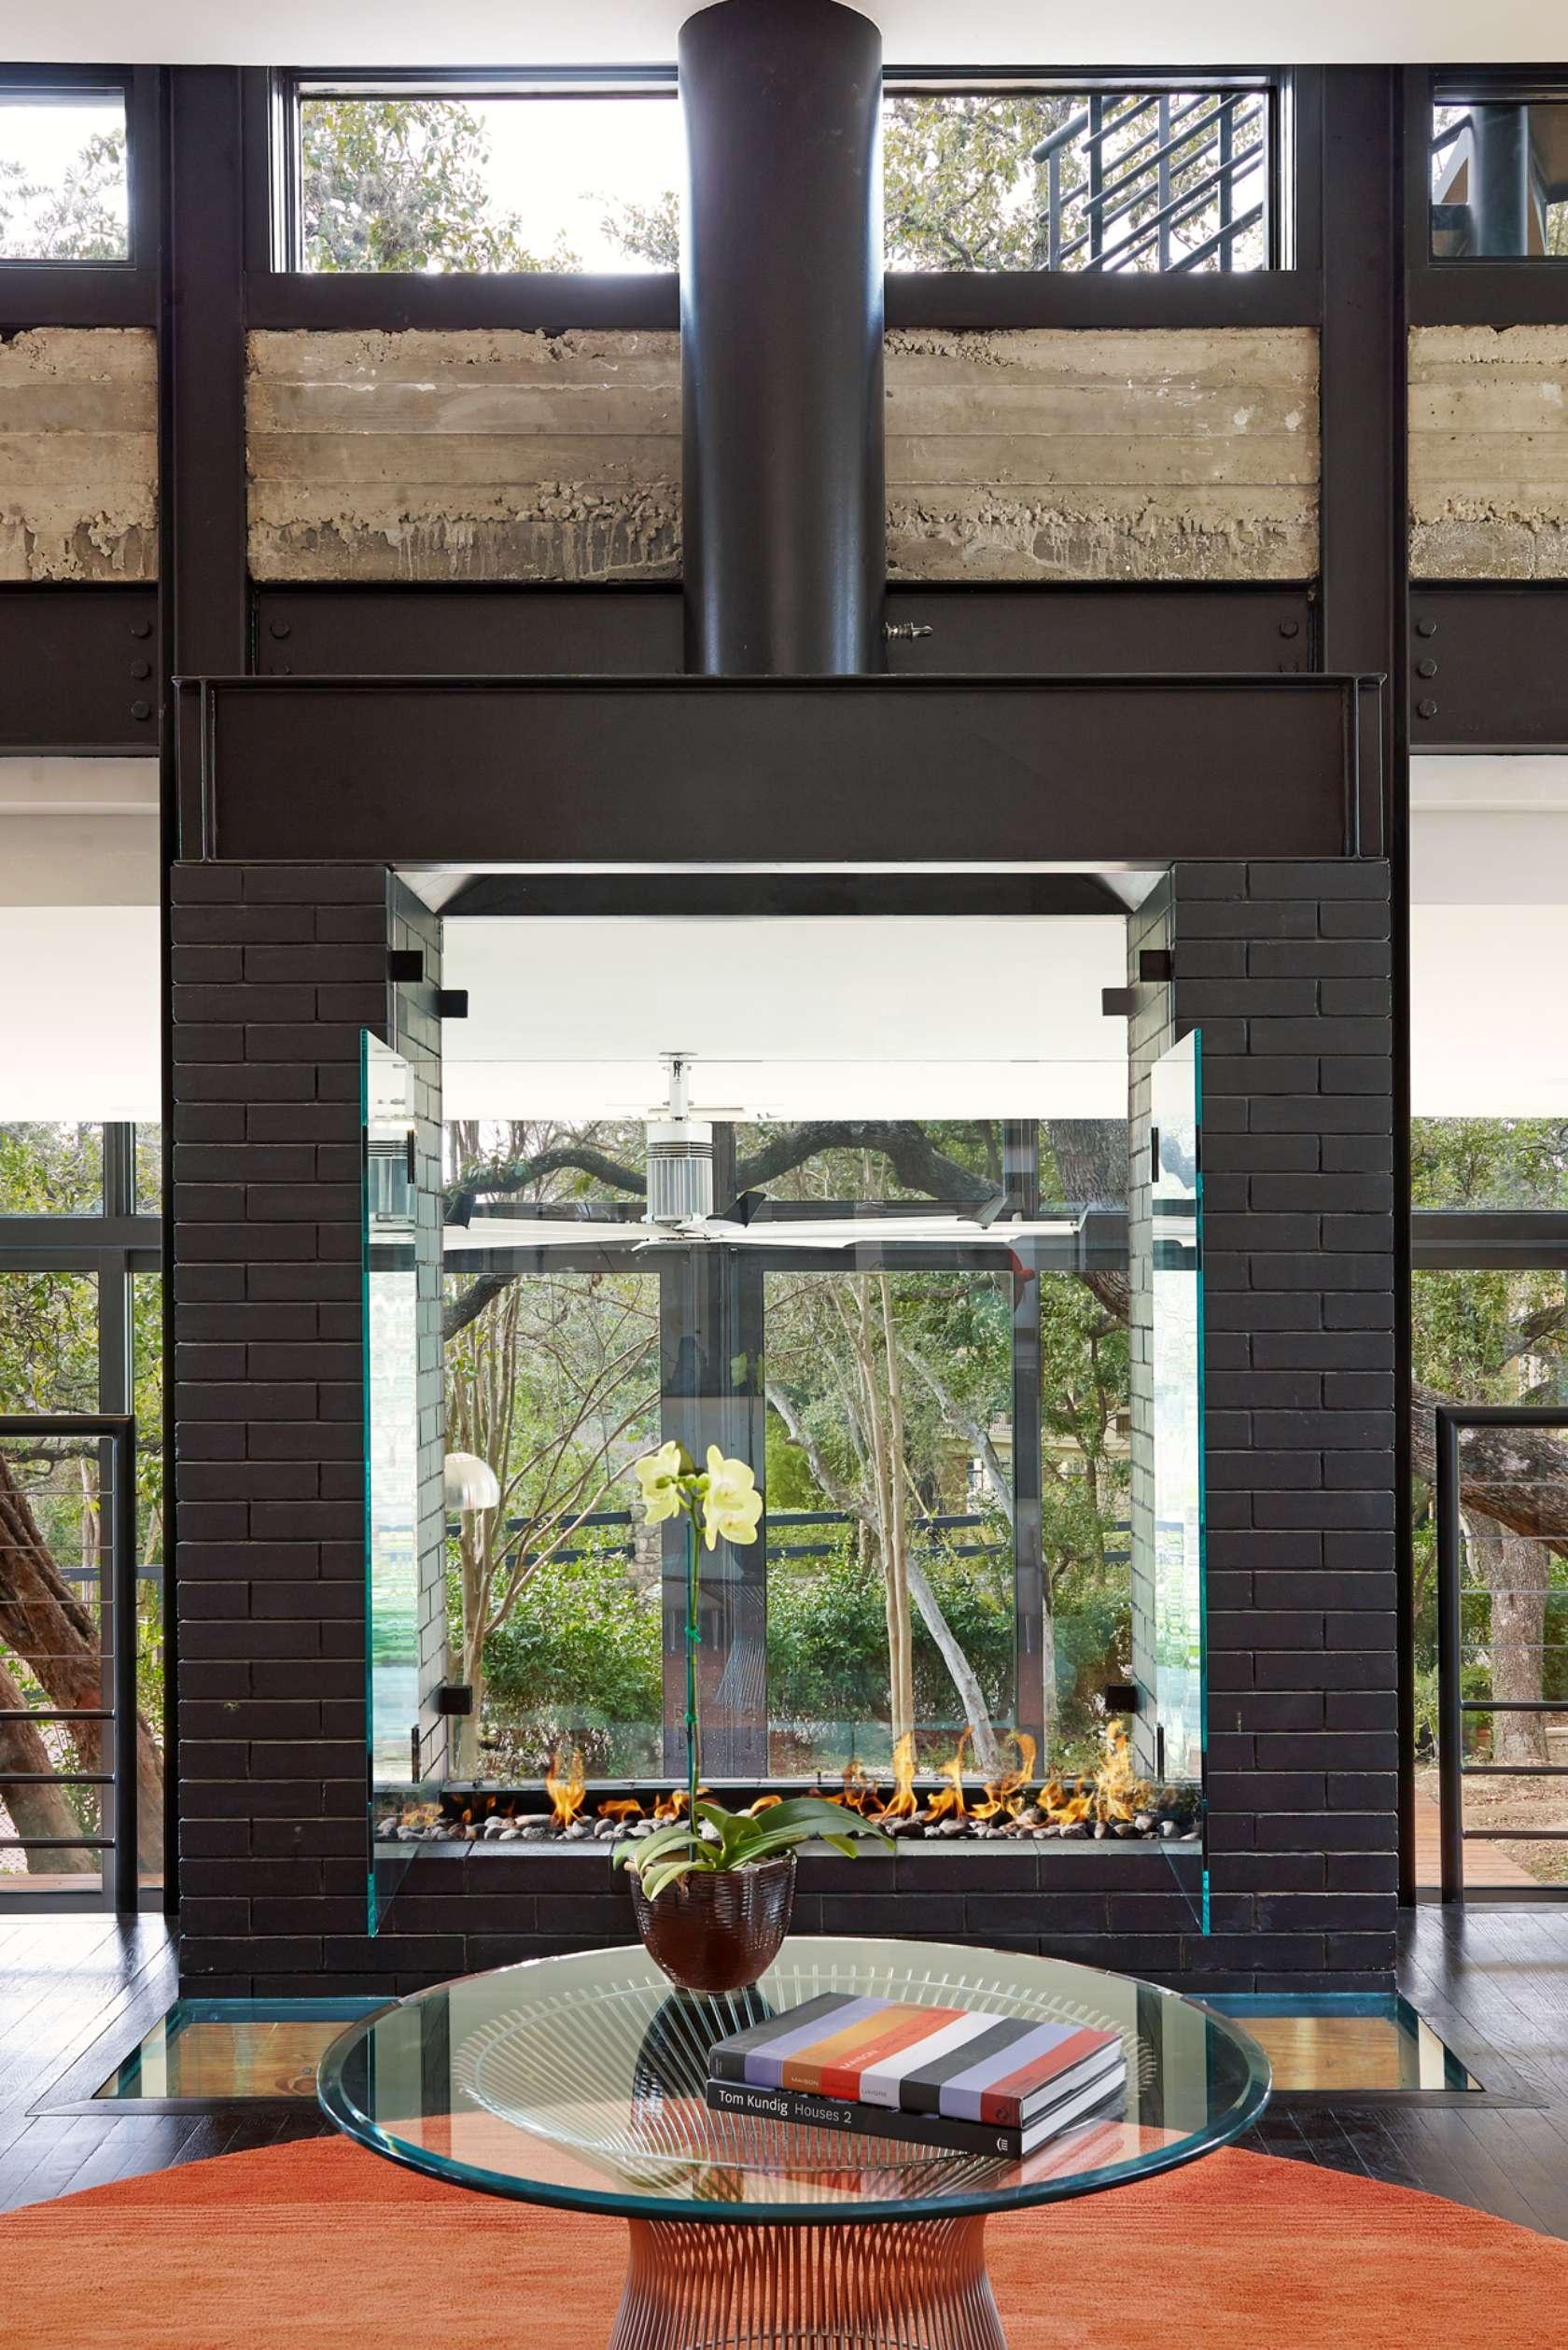 Kozub so zadnou sklenenou stenou dokonale zapadá do tohto skleneného achitektonického diela.